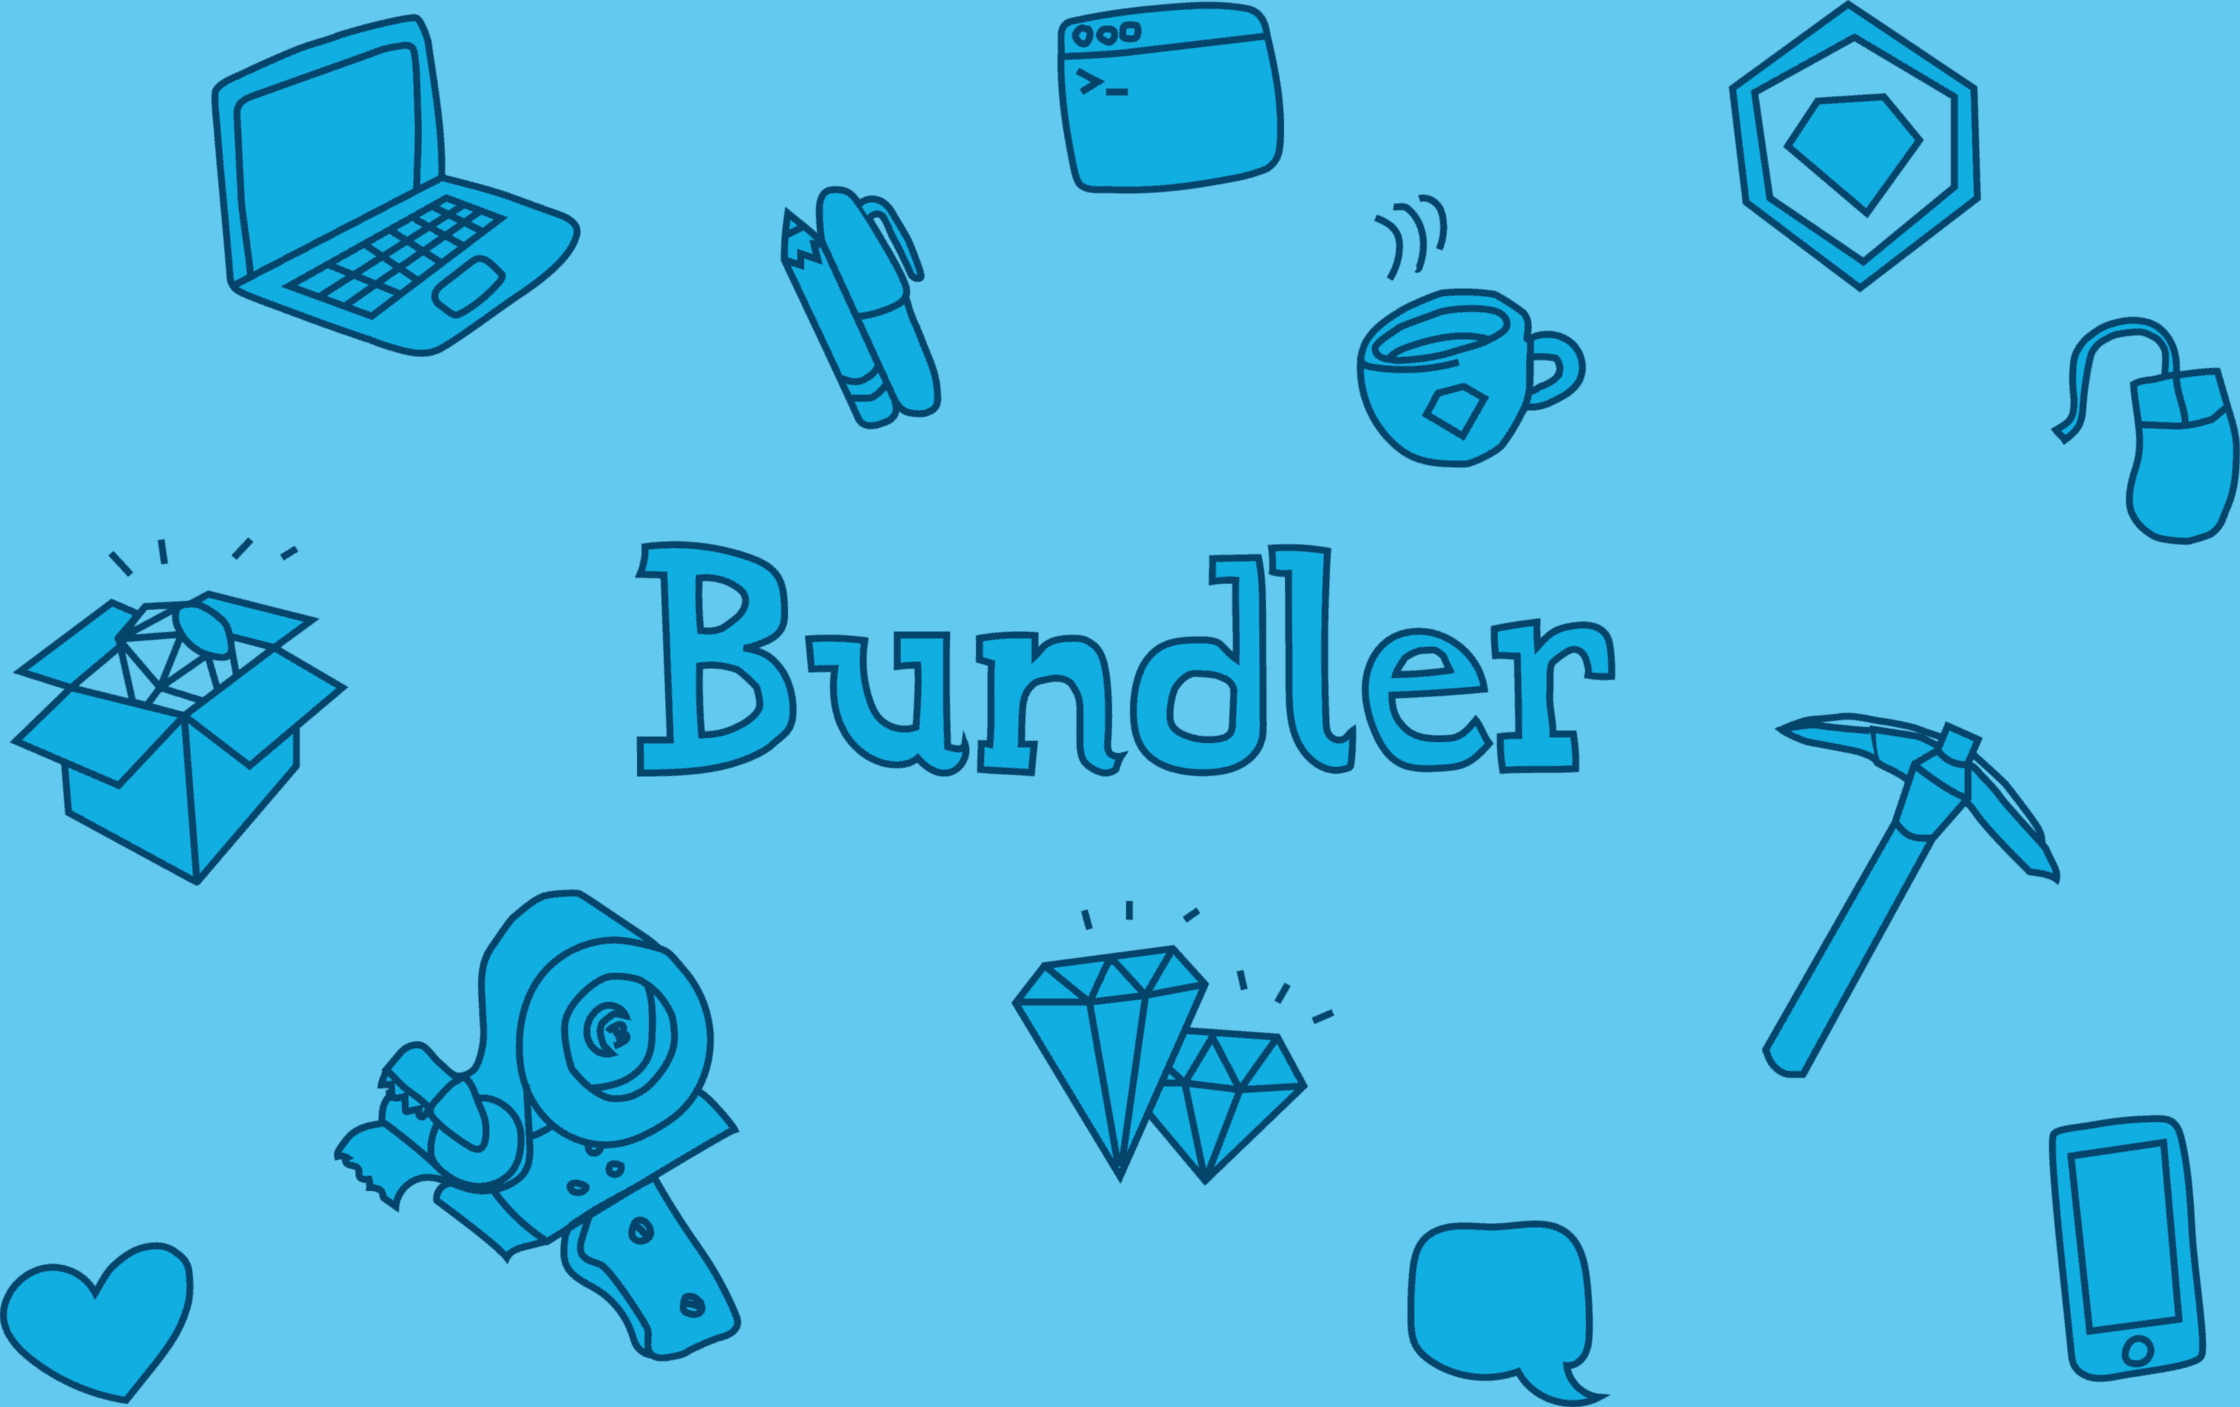 bundler